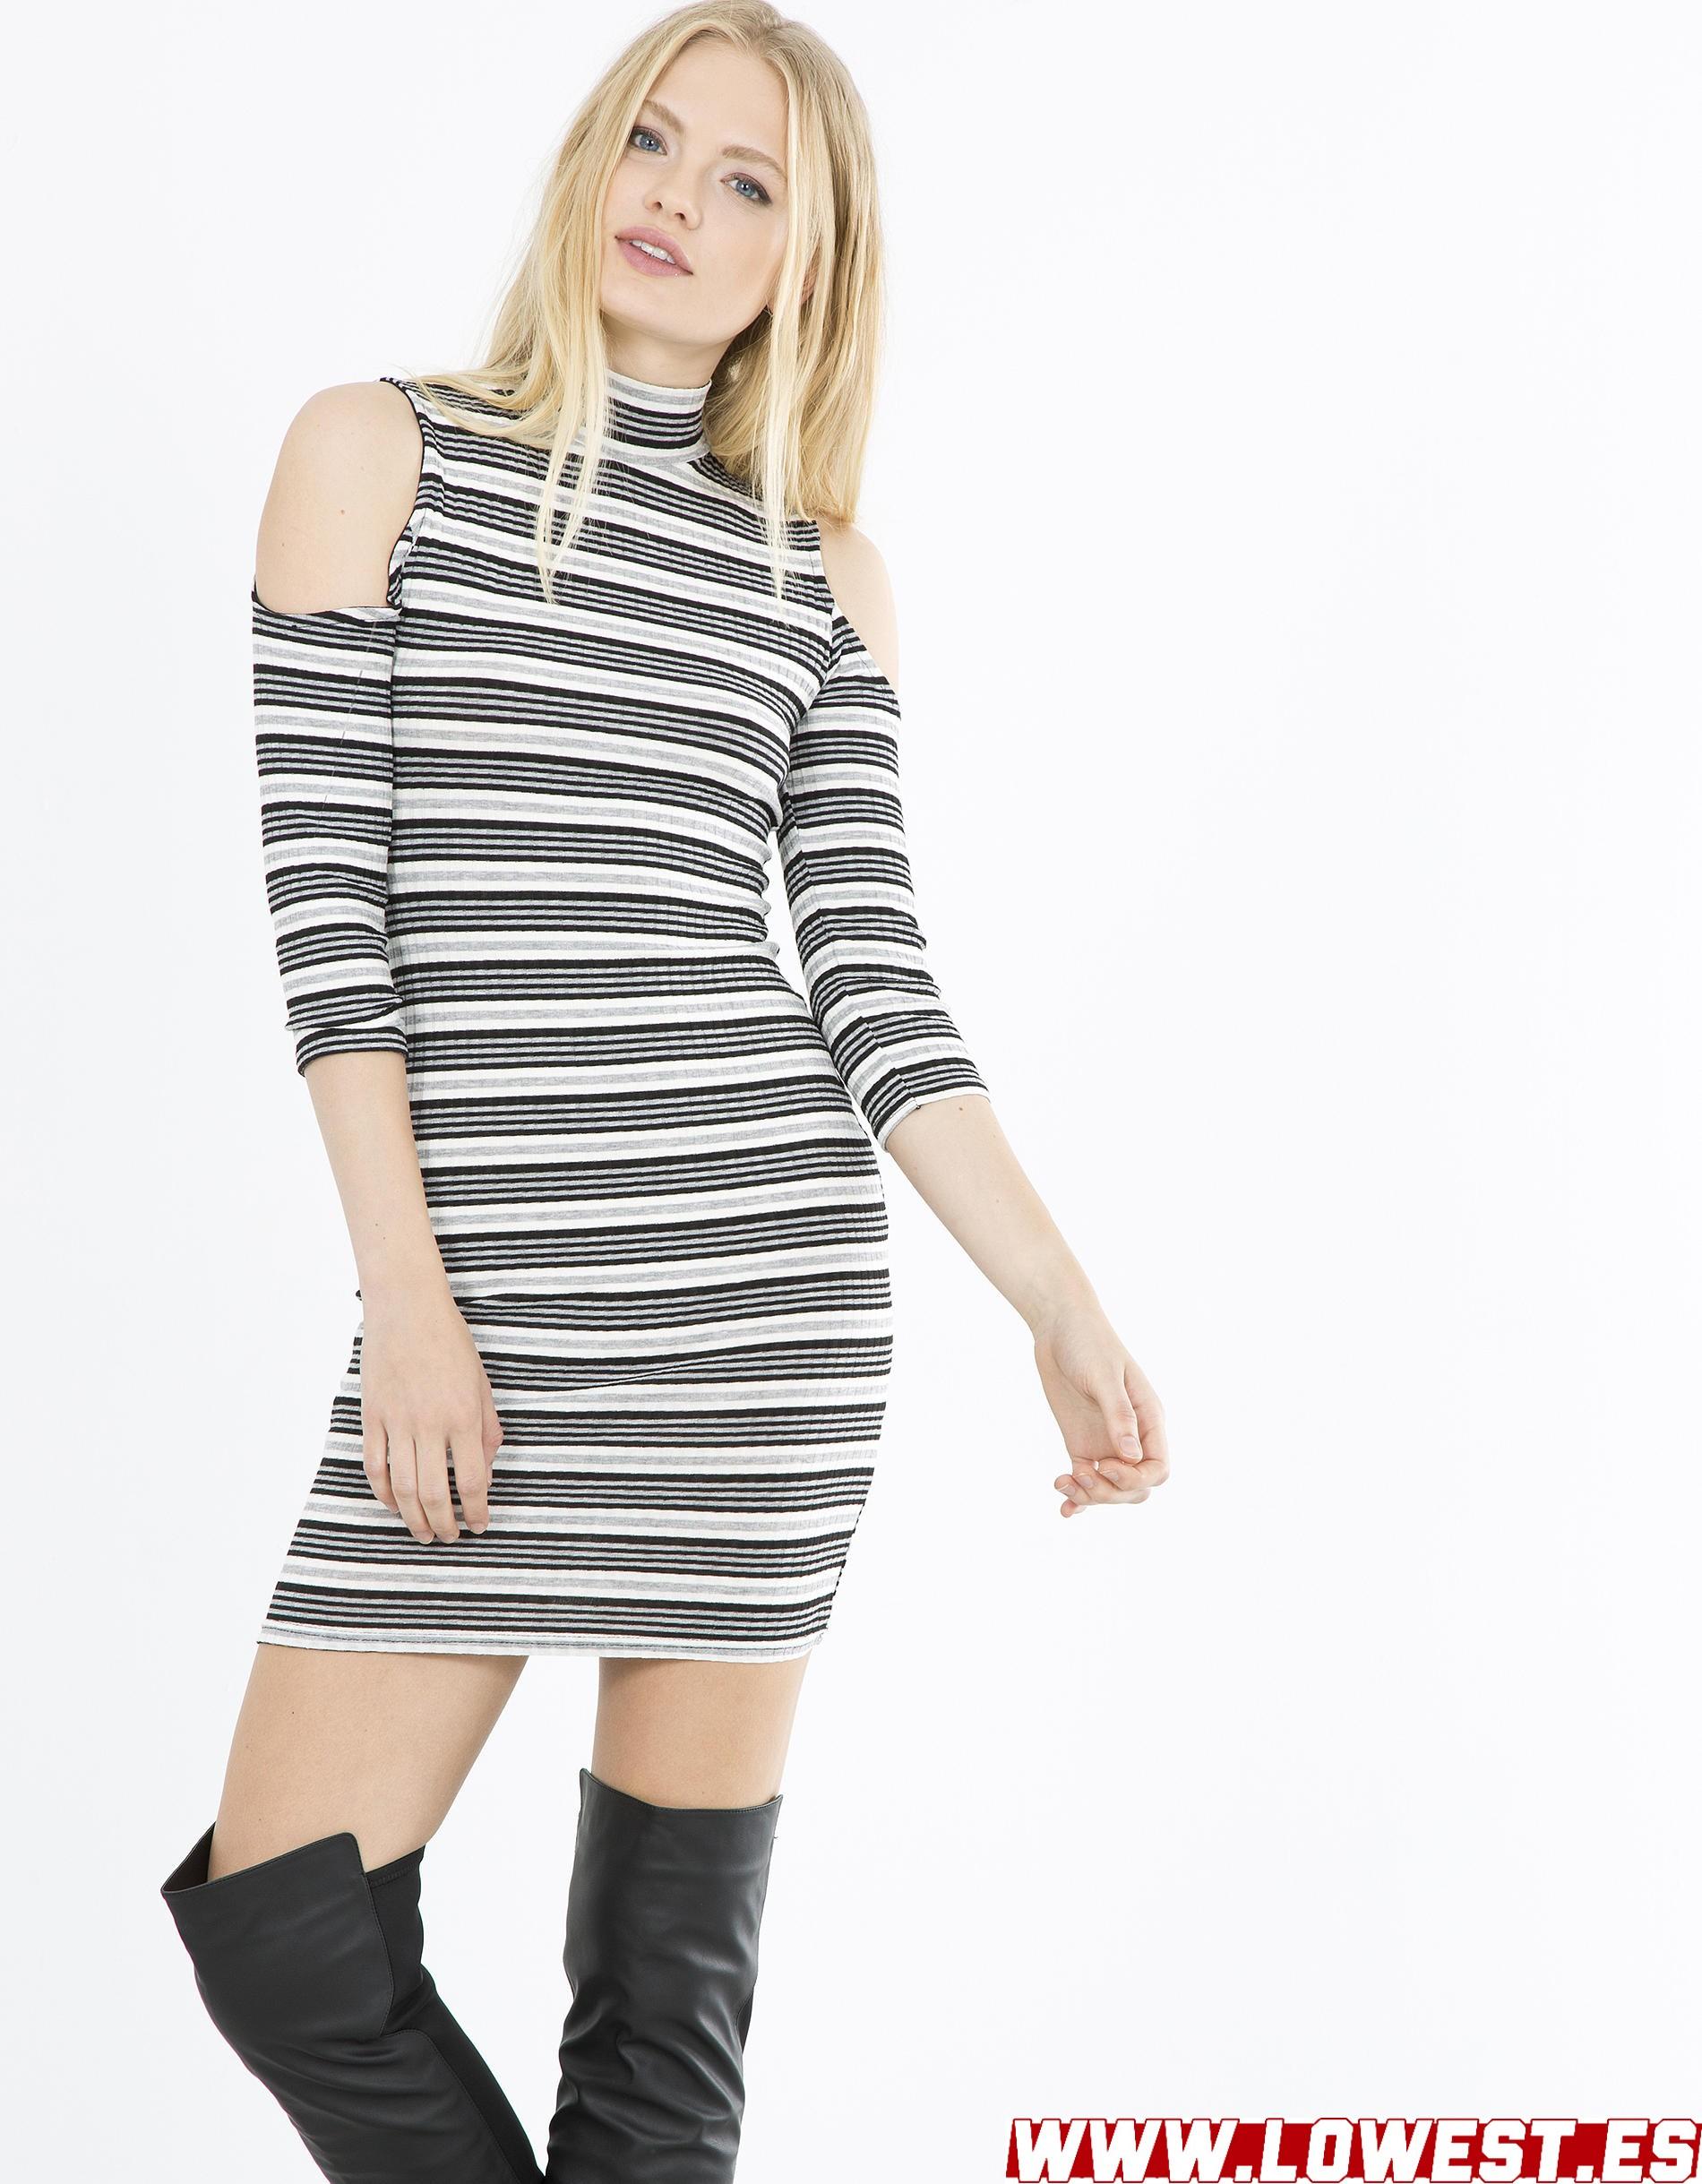 moda femenina catalogos online primeras marcas 2019 2020